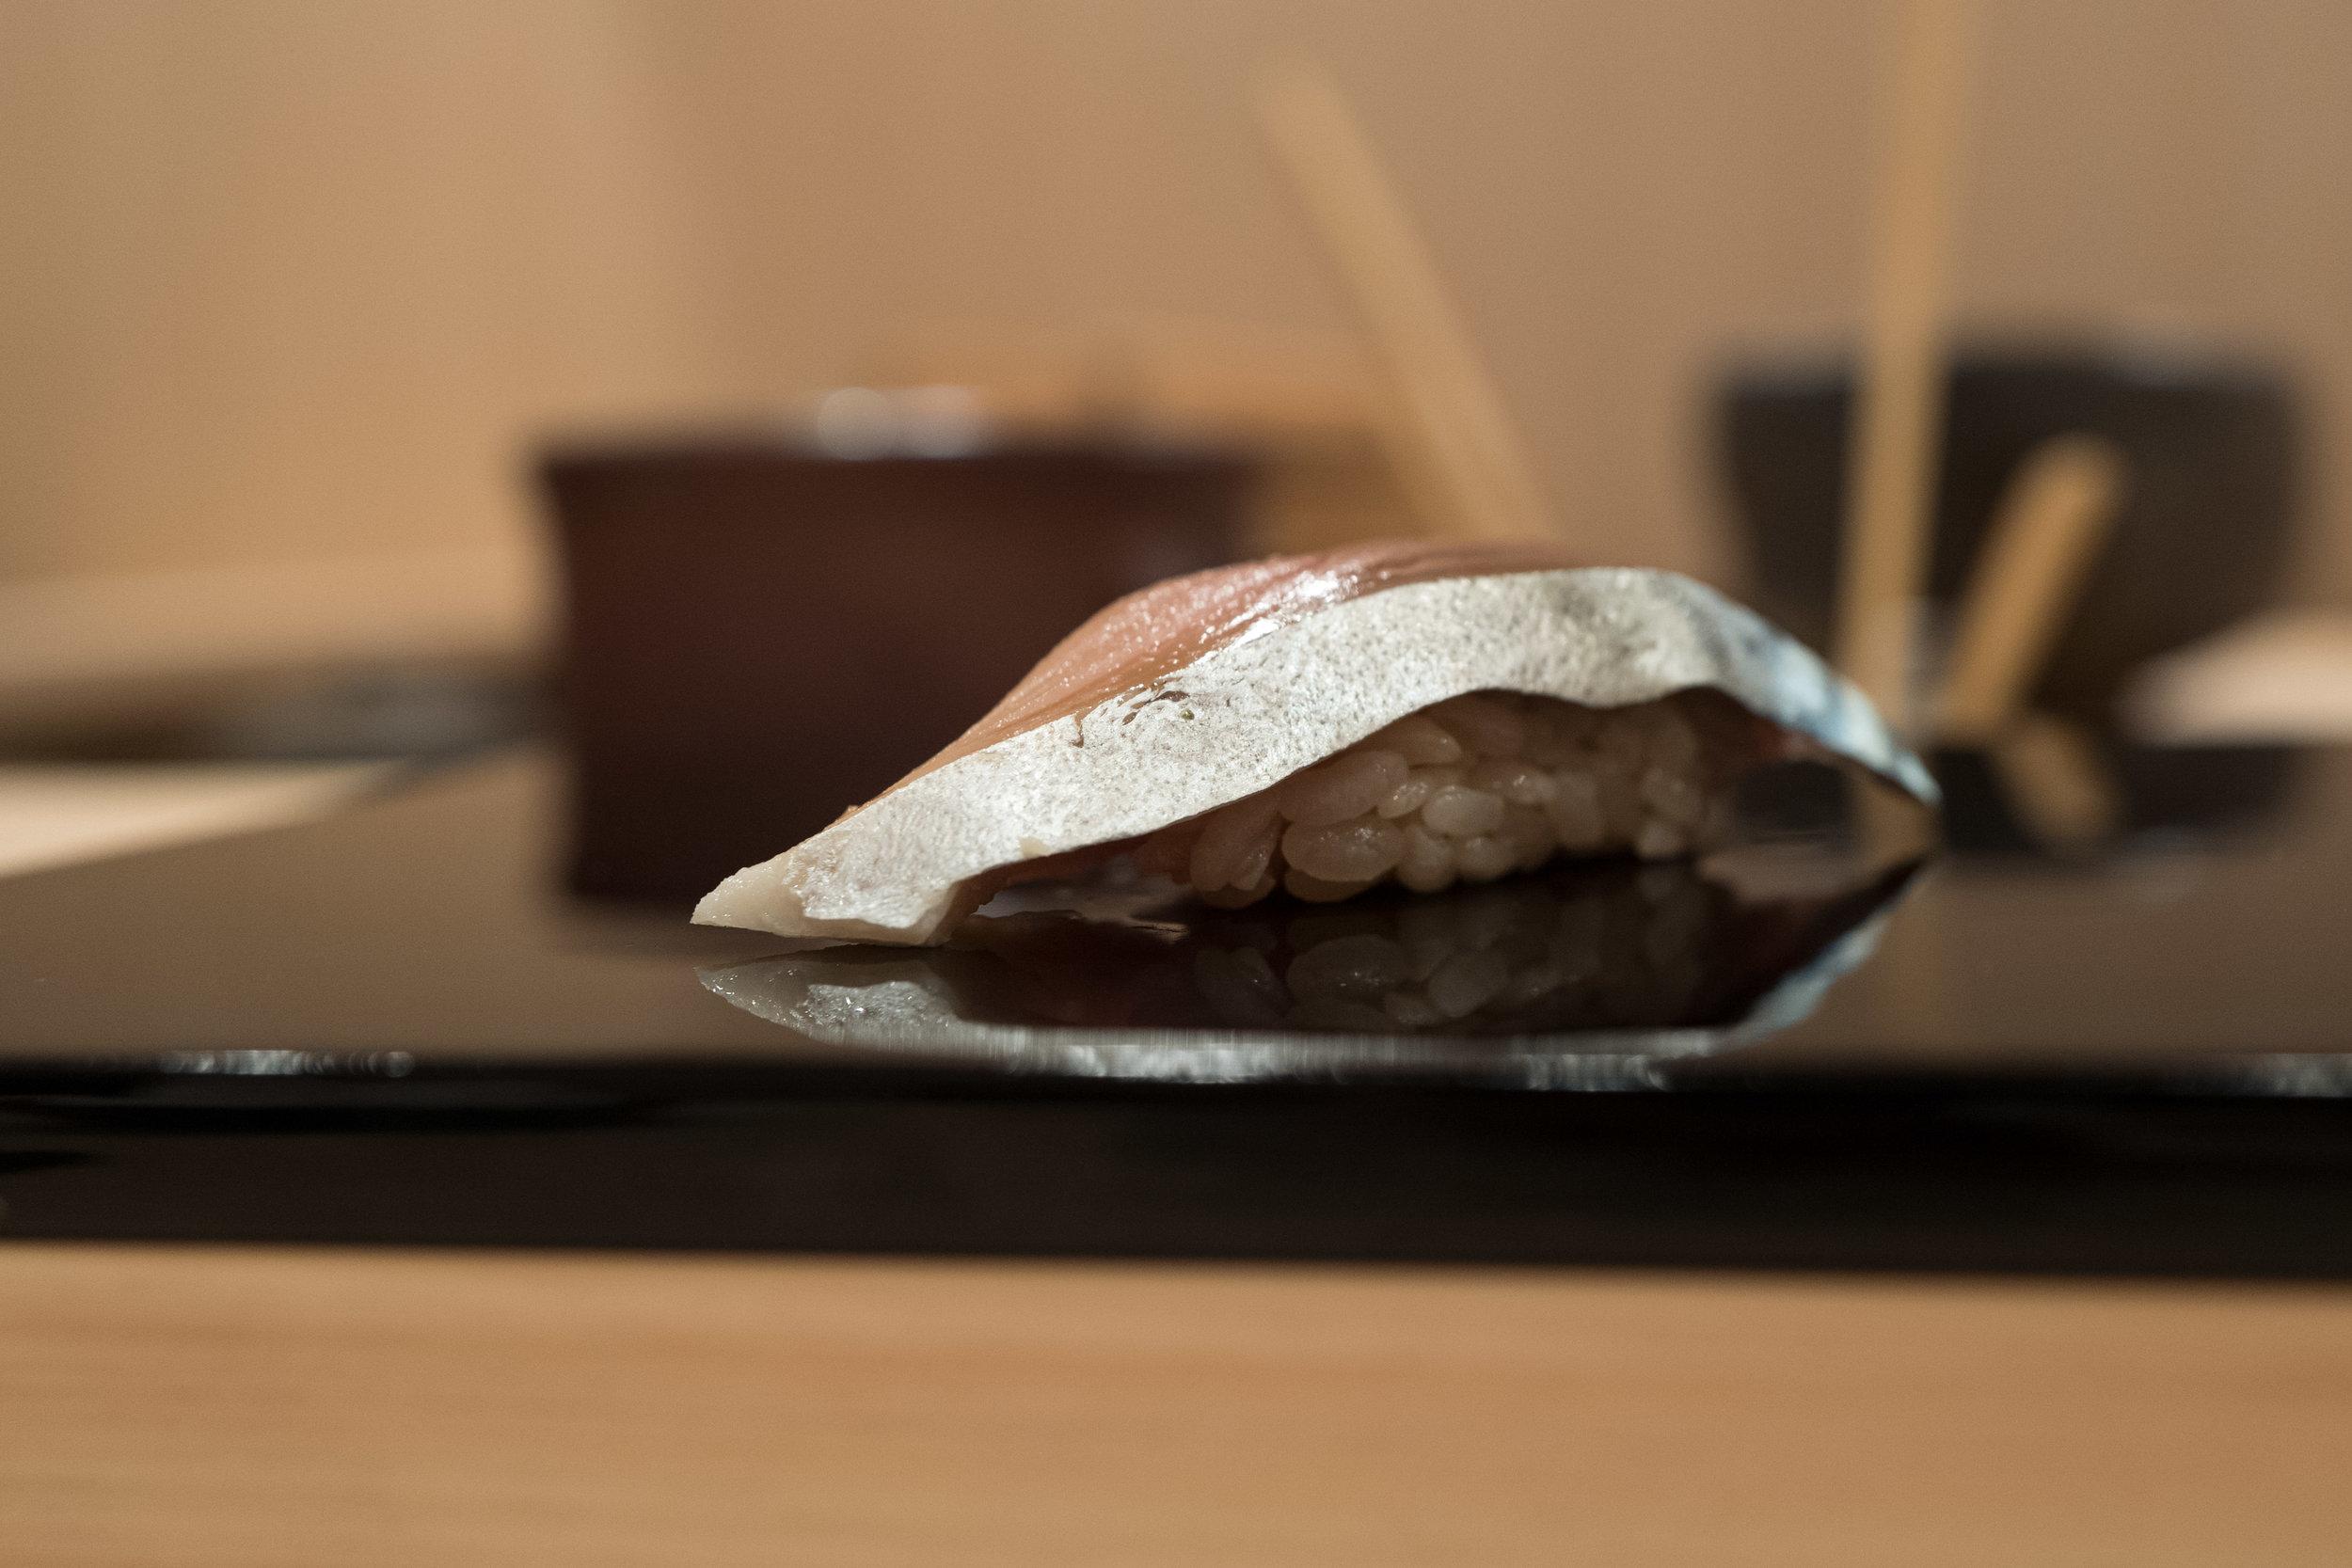 Keita-san's saba preparation is outstanding